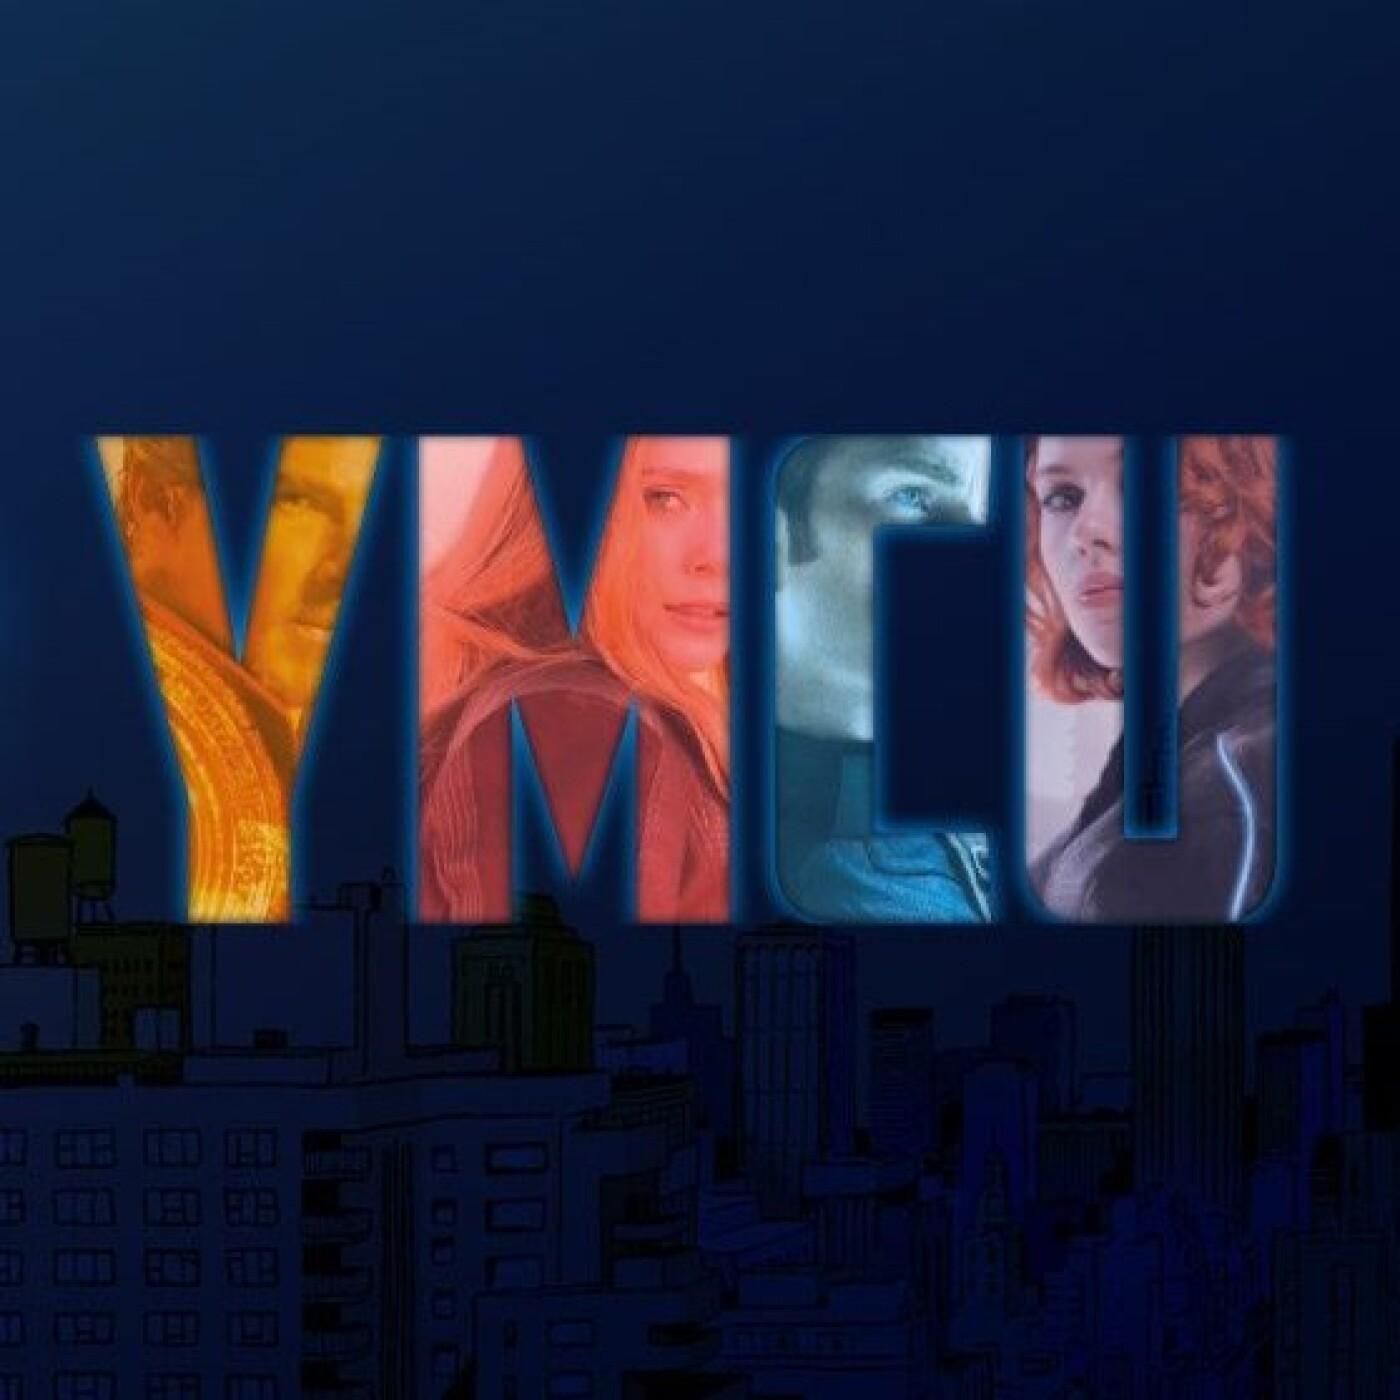 YMCU #6 - Trick or Treats (WandaVision épisode 6)